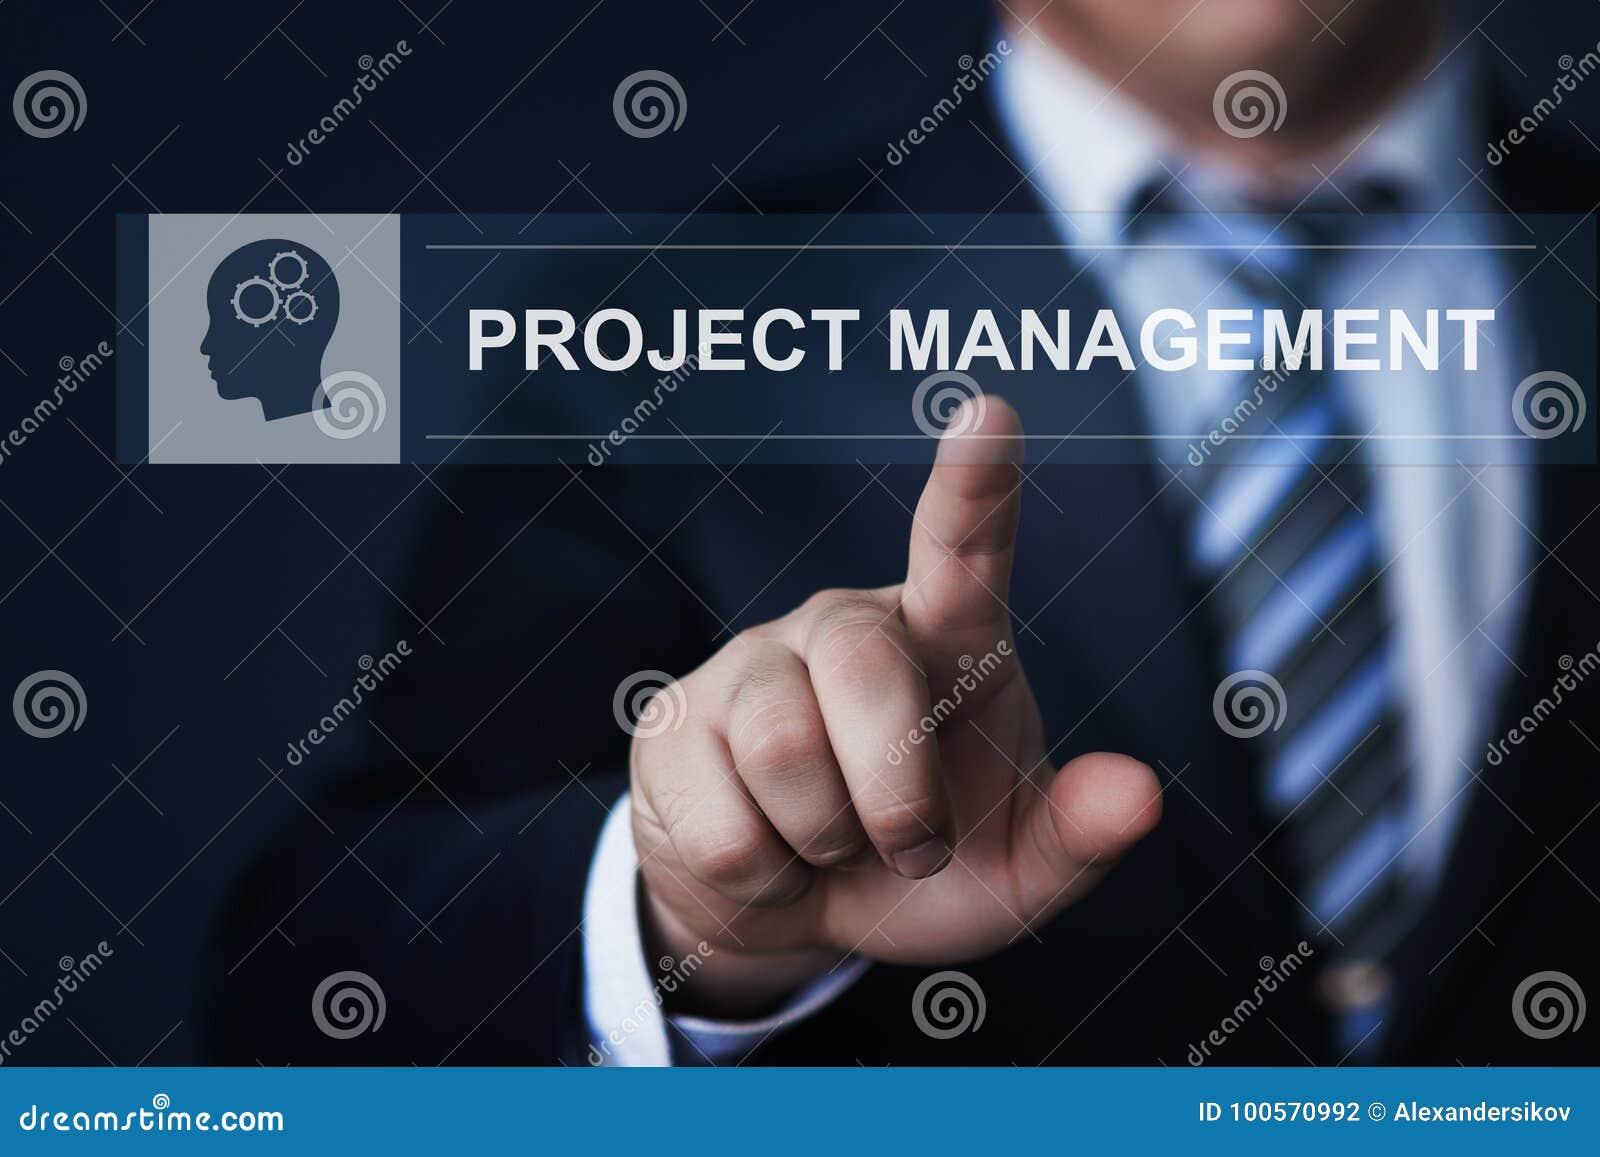 Project Management Strategy Plan Internet Business Technology Concept